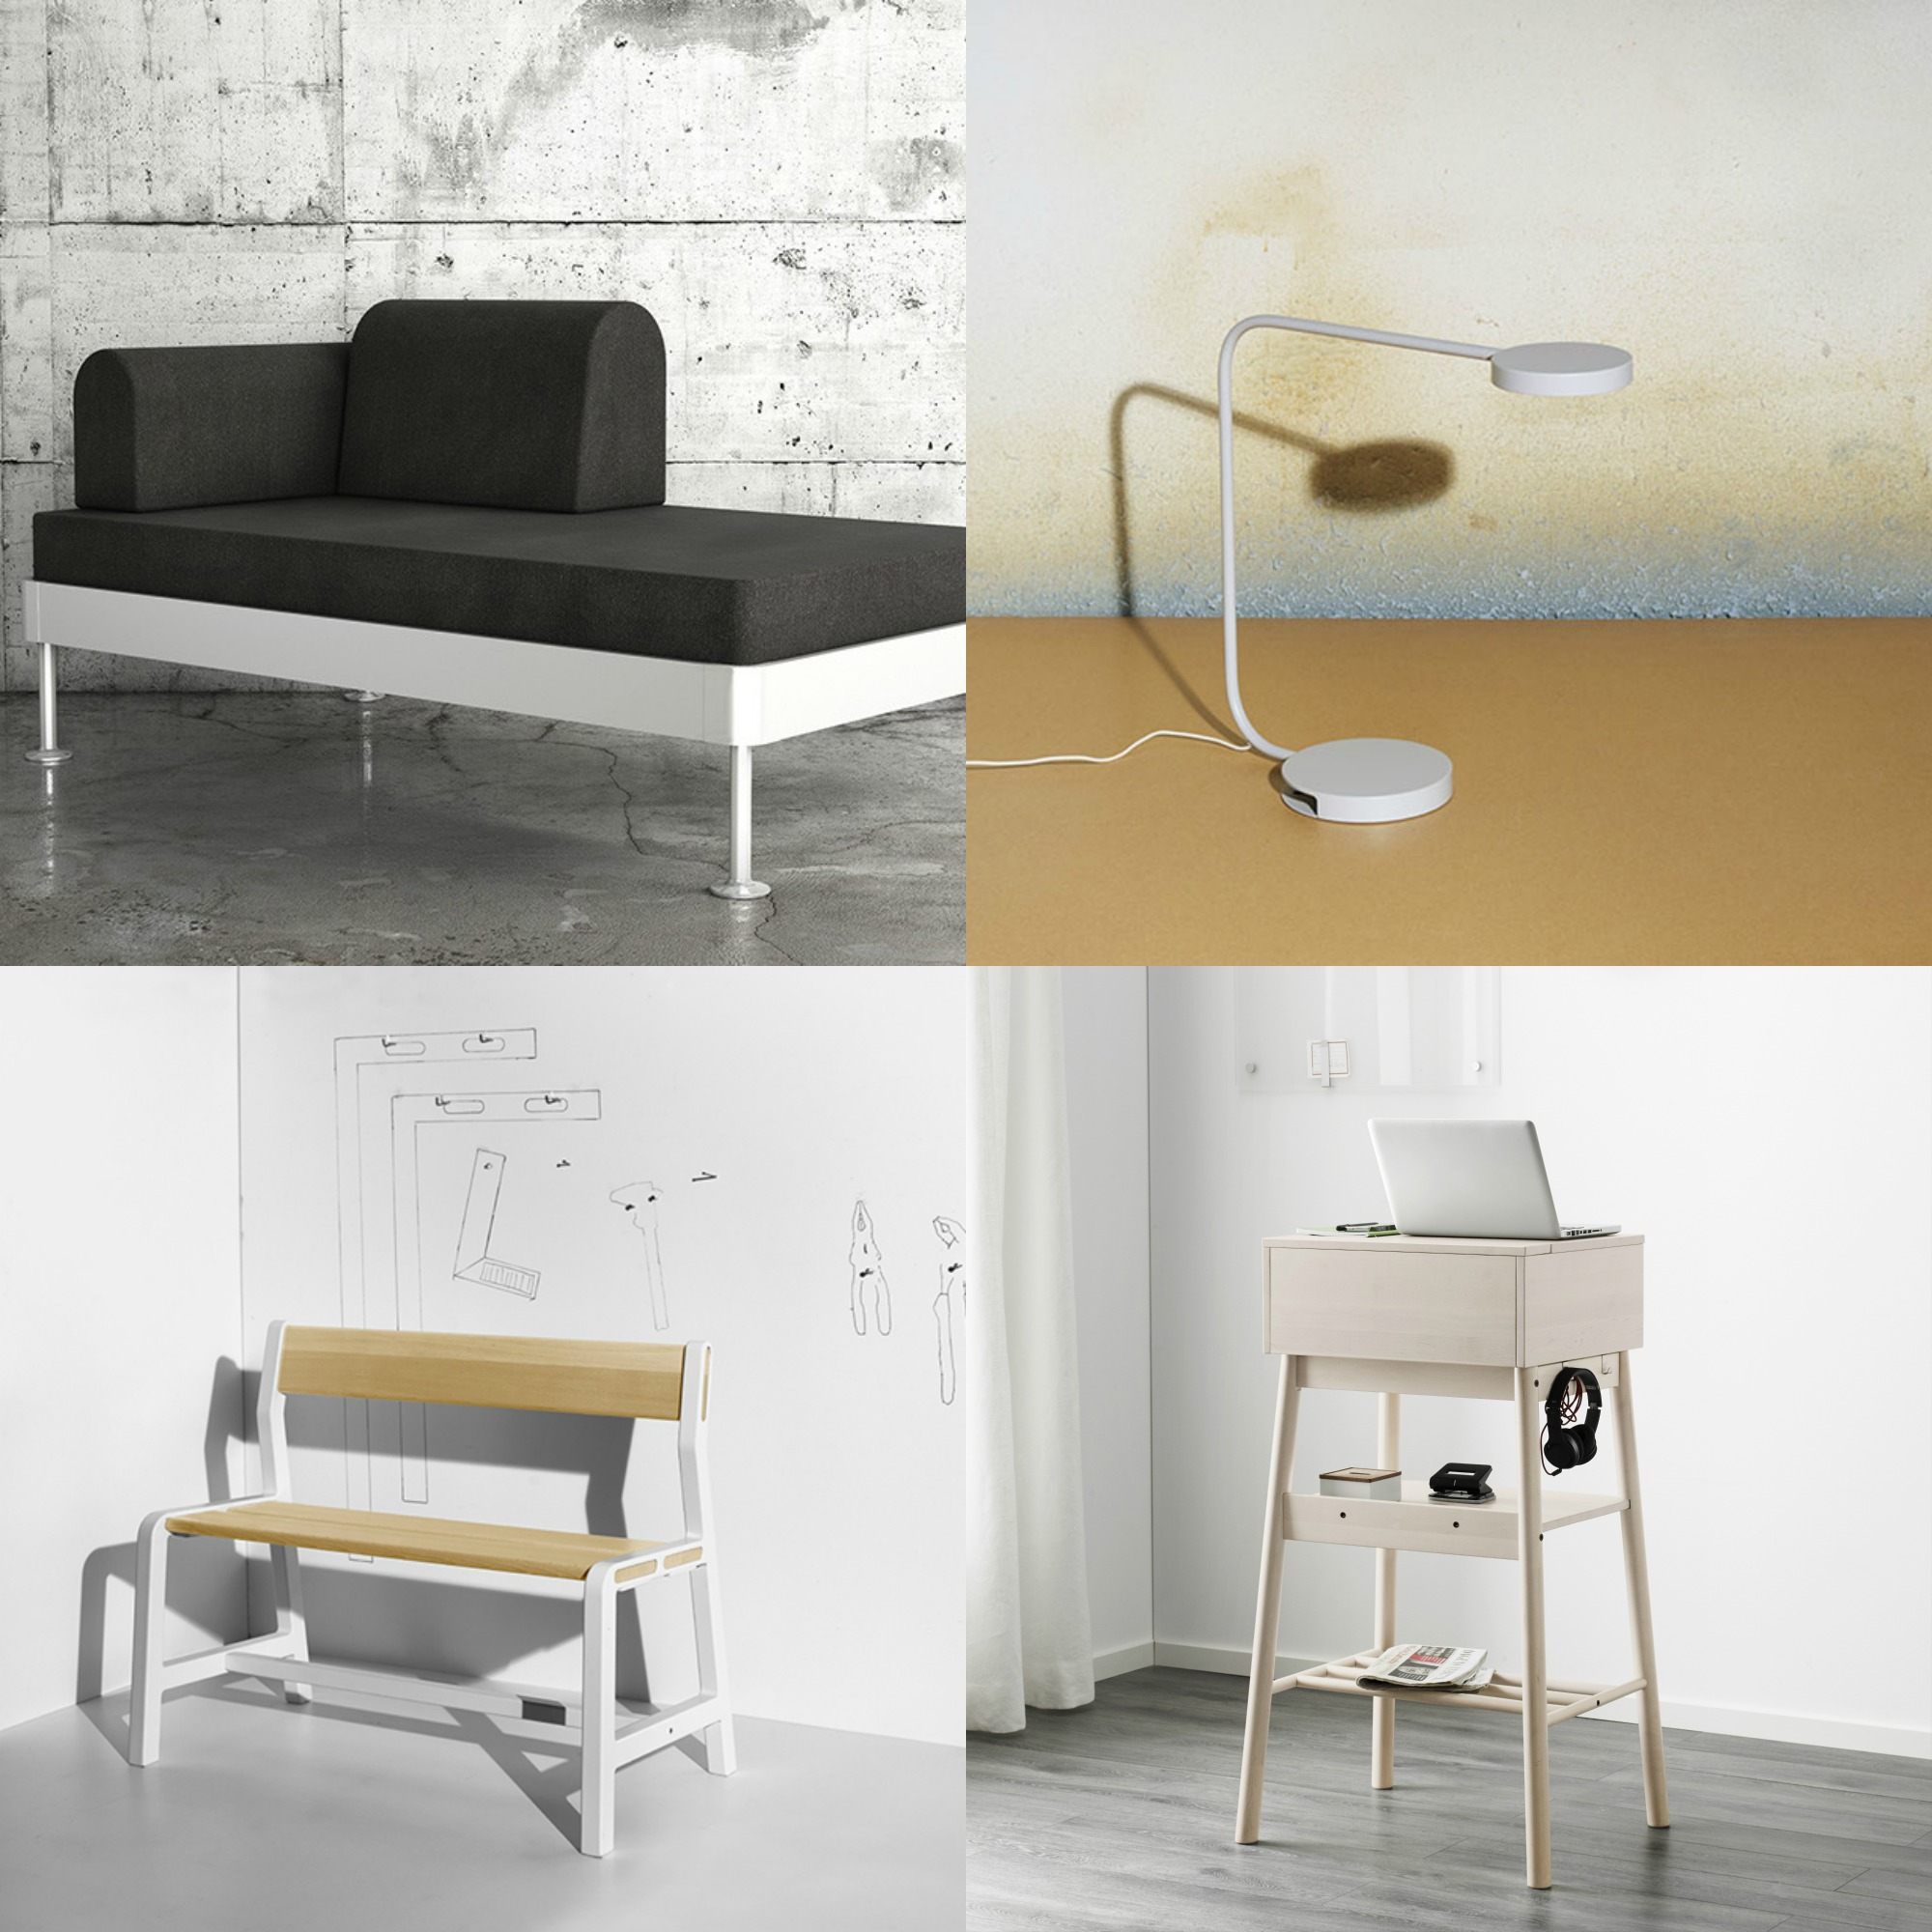 tom dixons kooperation mit ikea. Black Bedroom Furniture Sets. Home Design Ideas